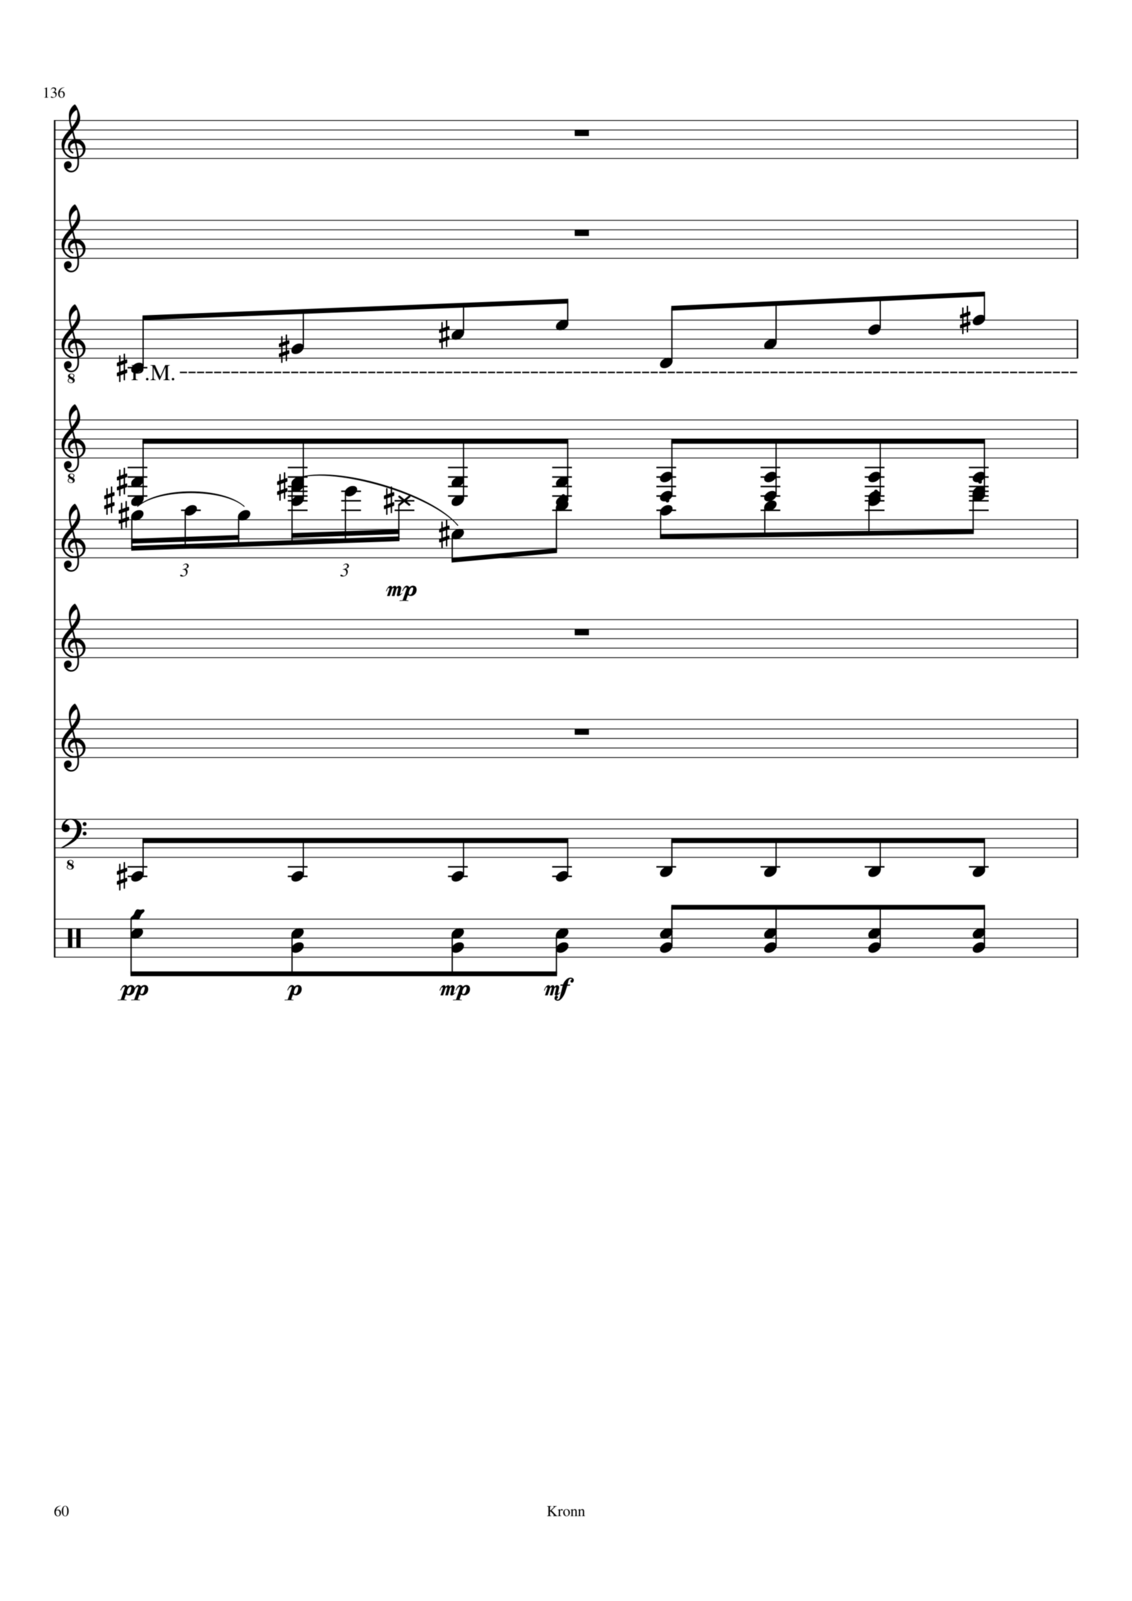 Ispoved Pervogo Boga slide, Image 60